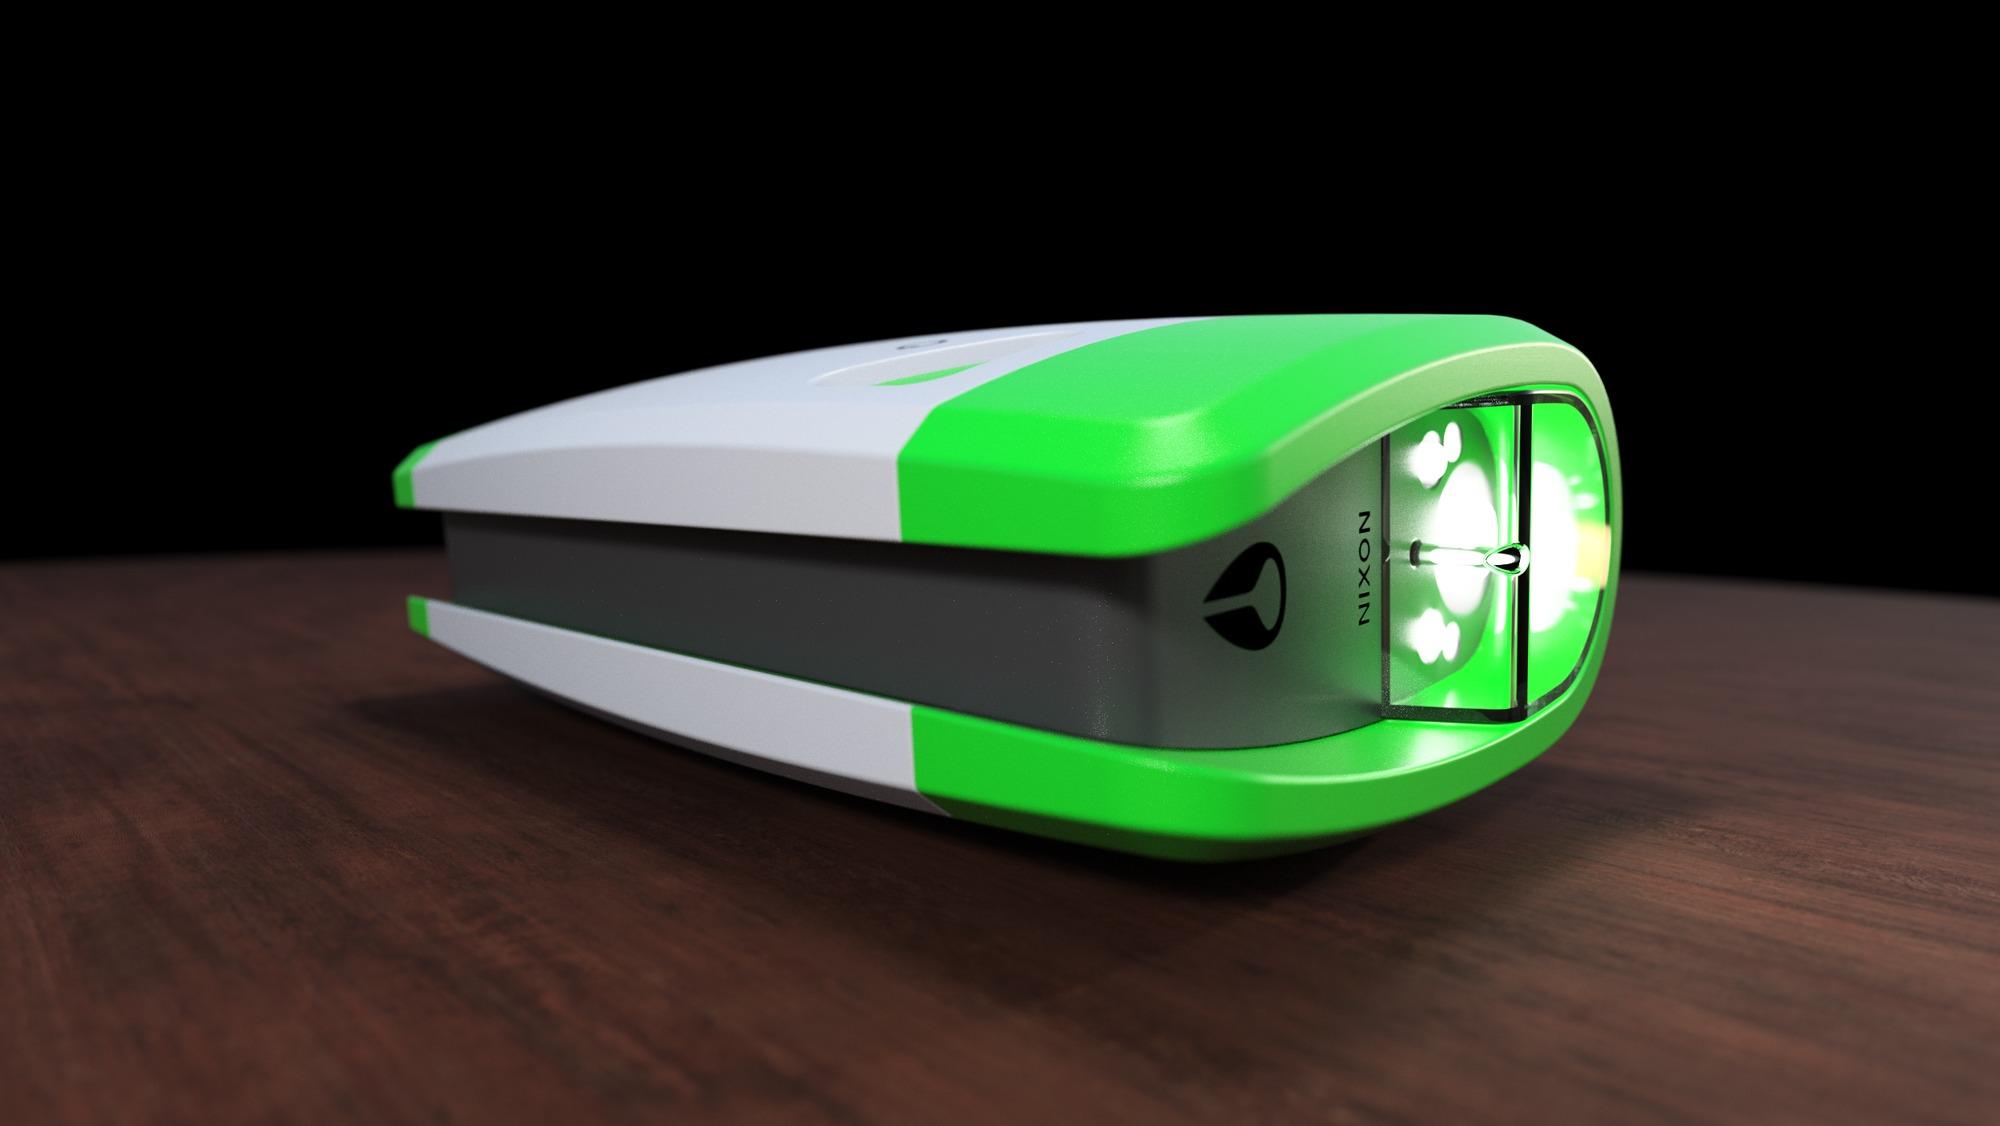 Flashlight_design_workflow_2015-oct-01_10-43-05pm-000_customizedview61816635